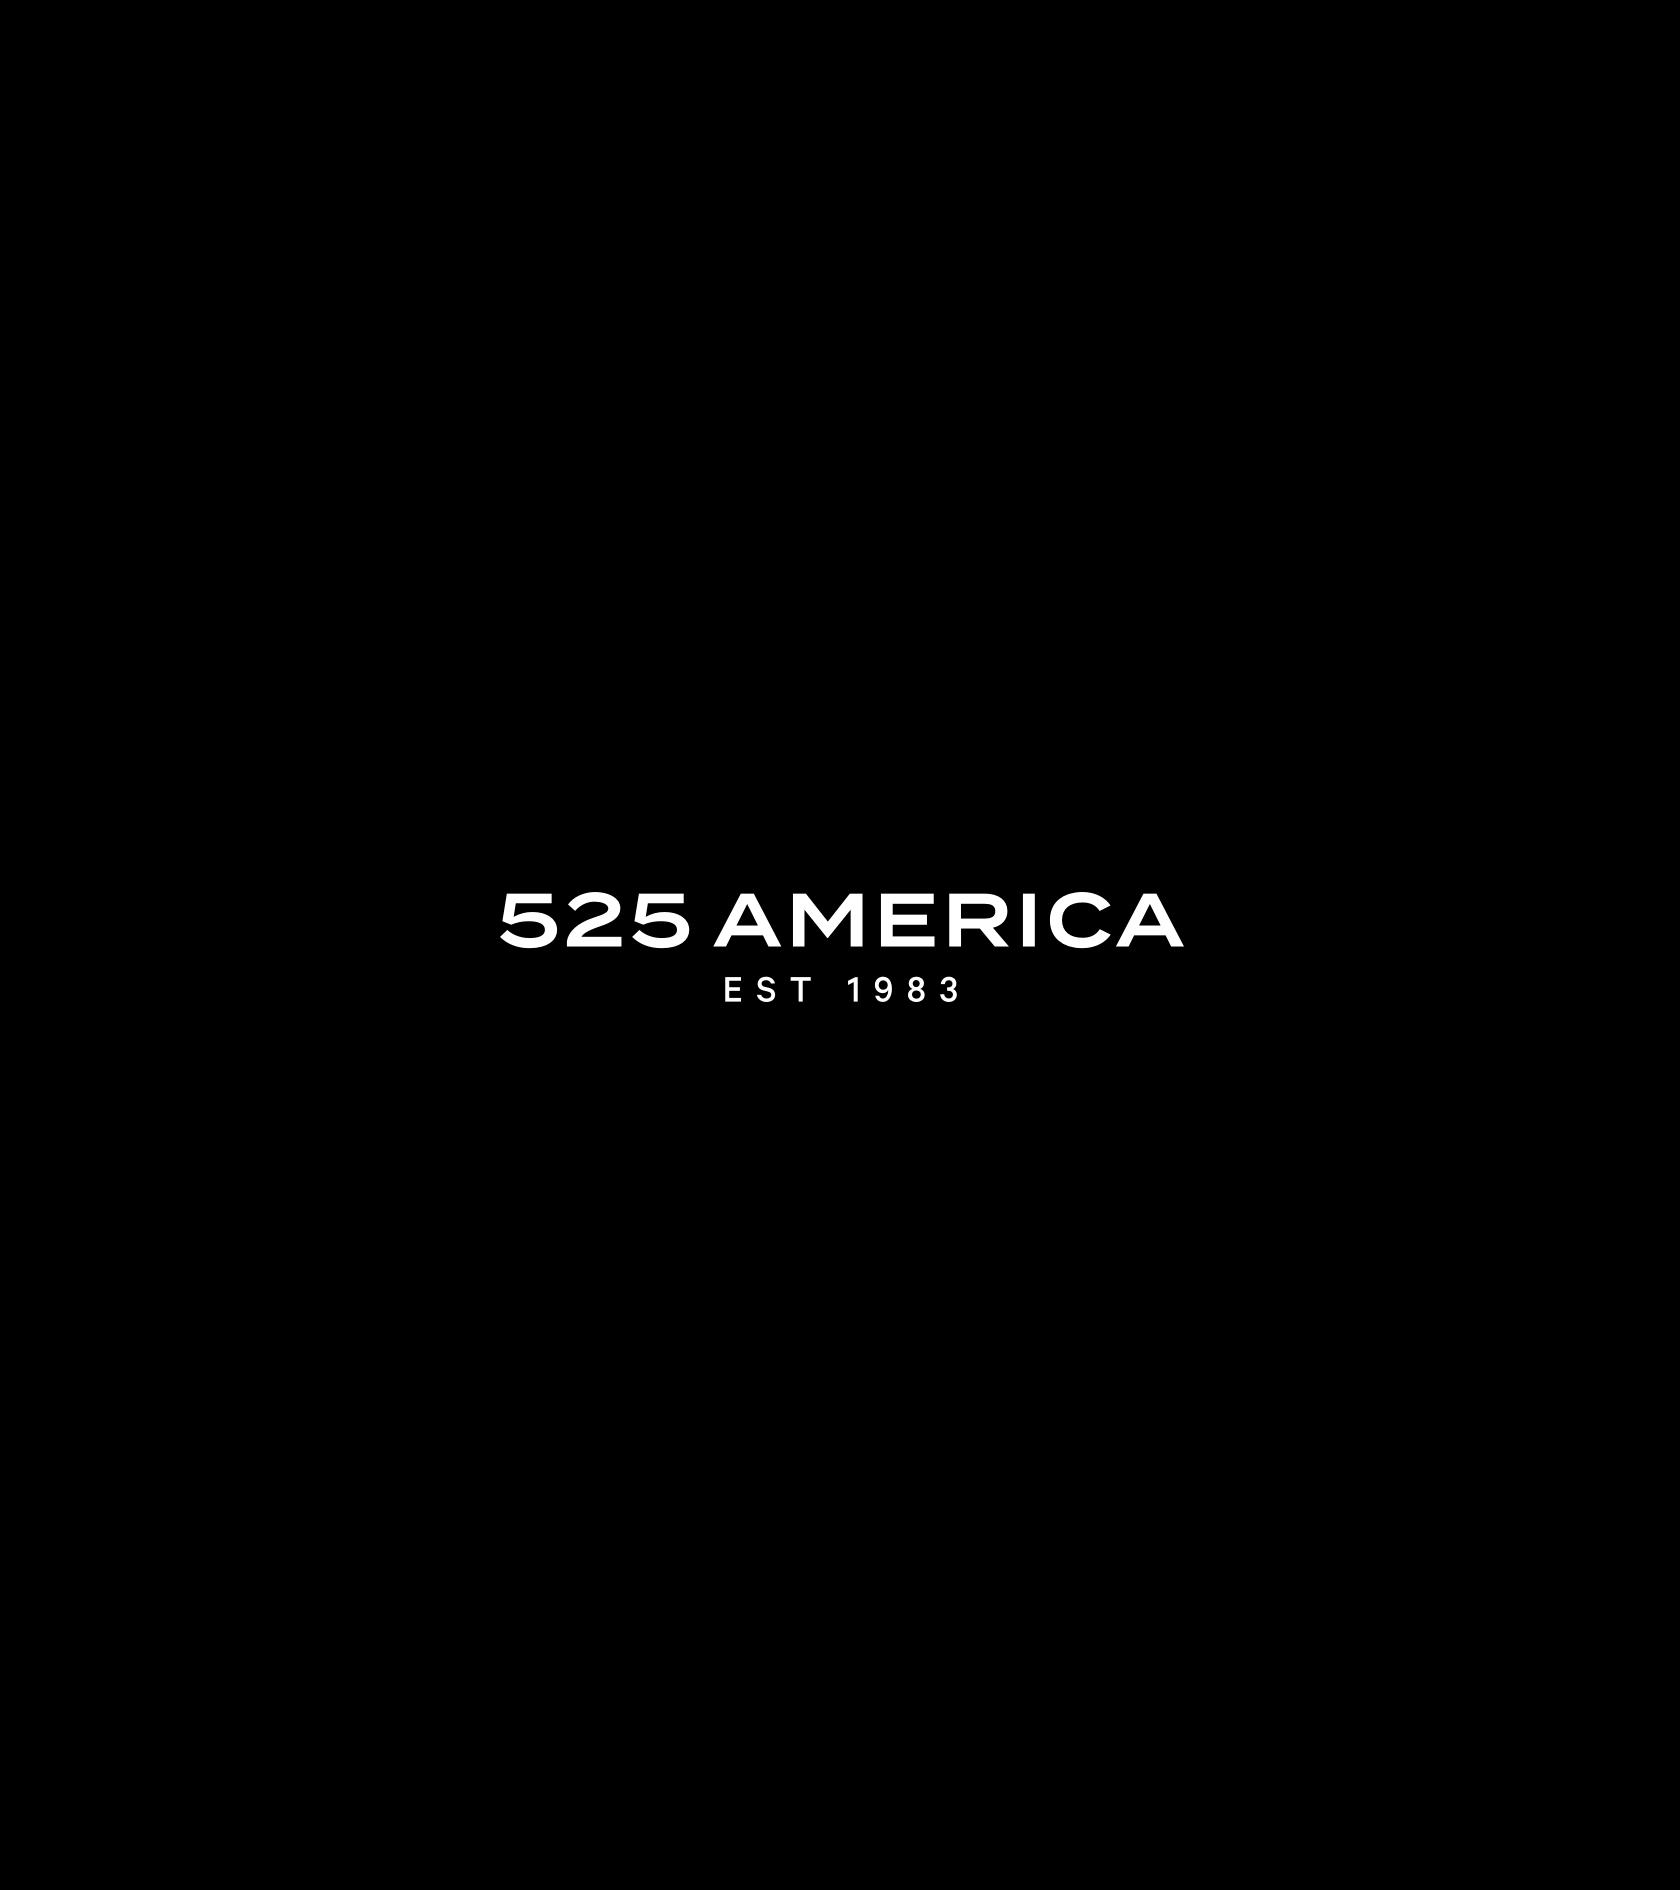 525 America Logo